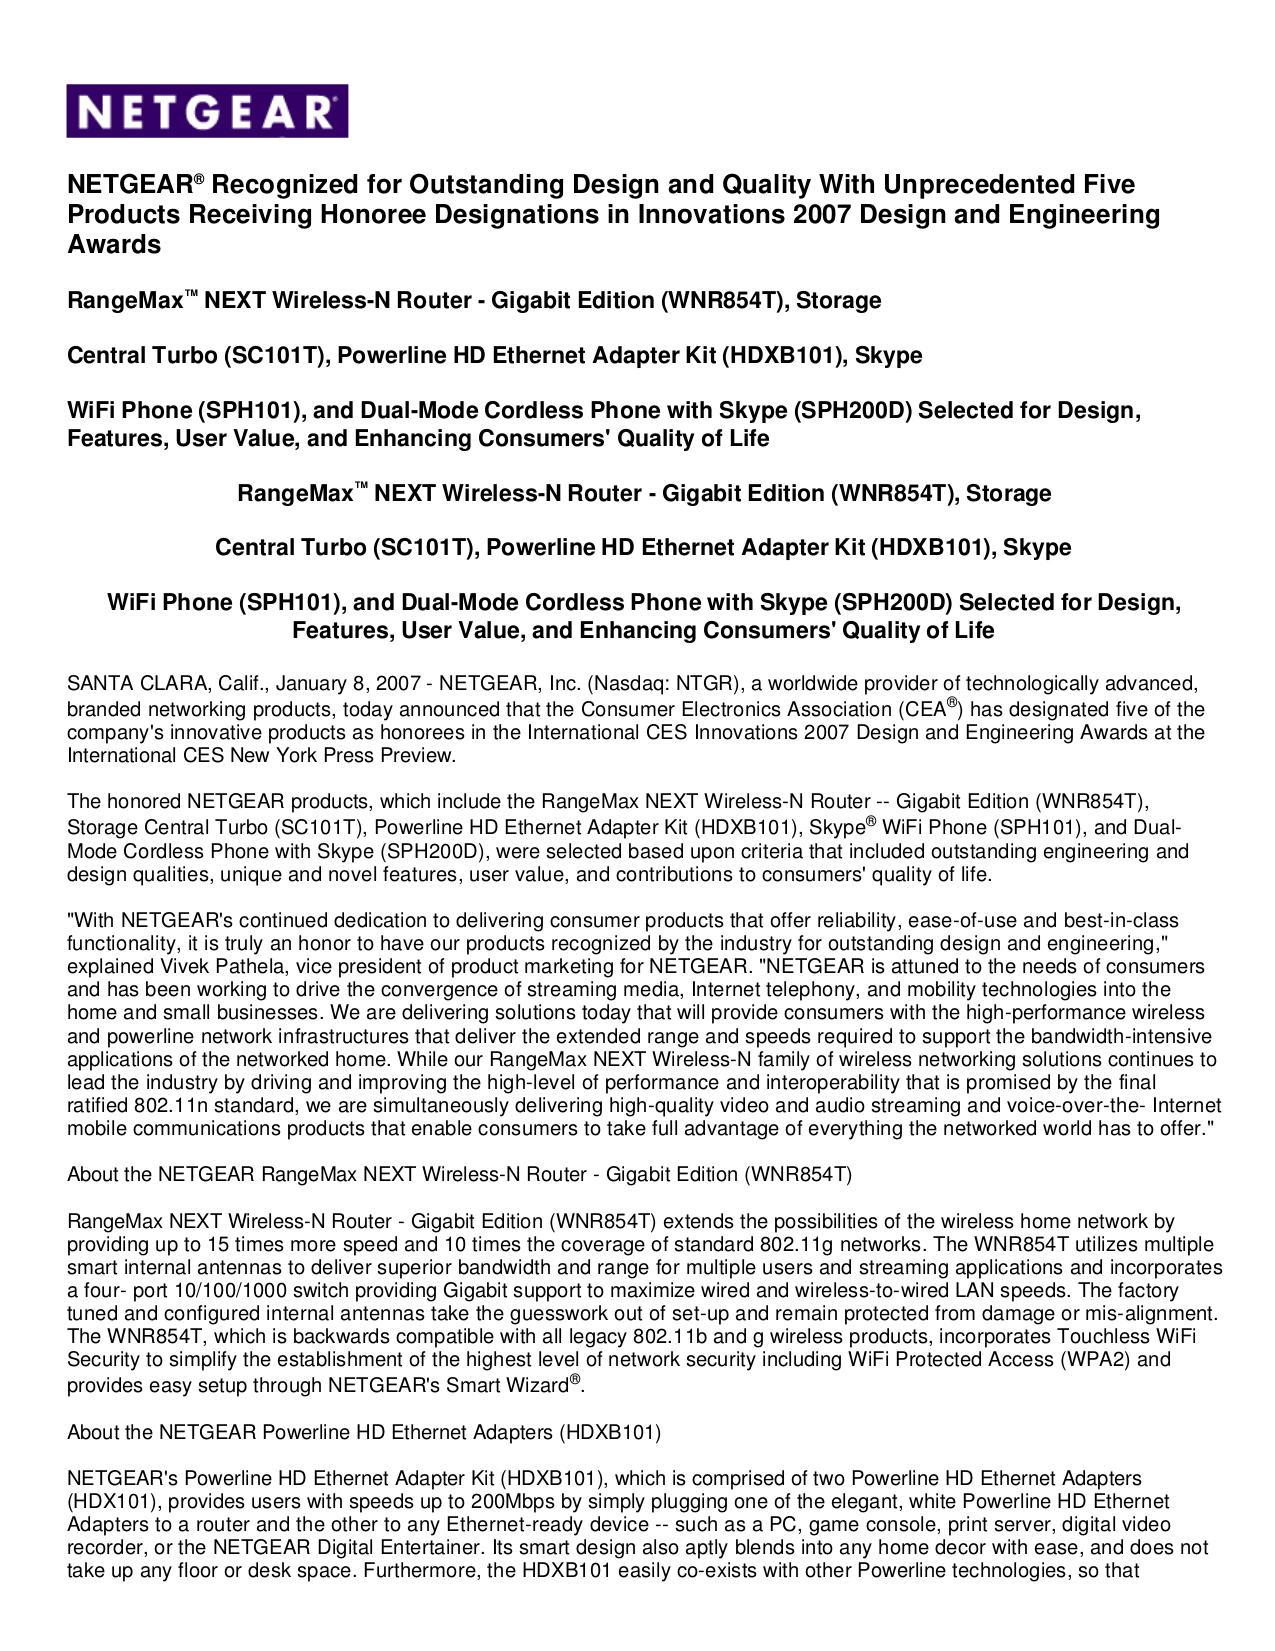 pdf for Netgear Telephone SPH200D manual